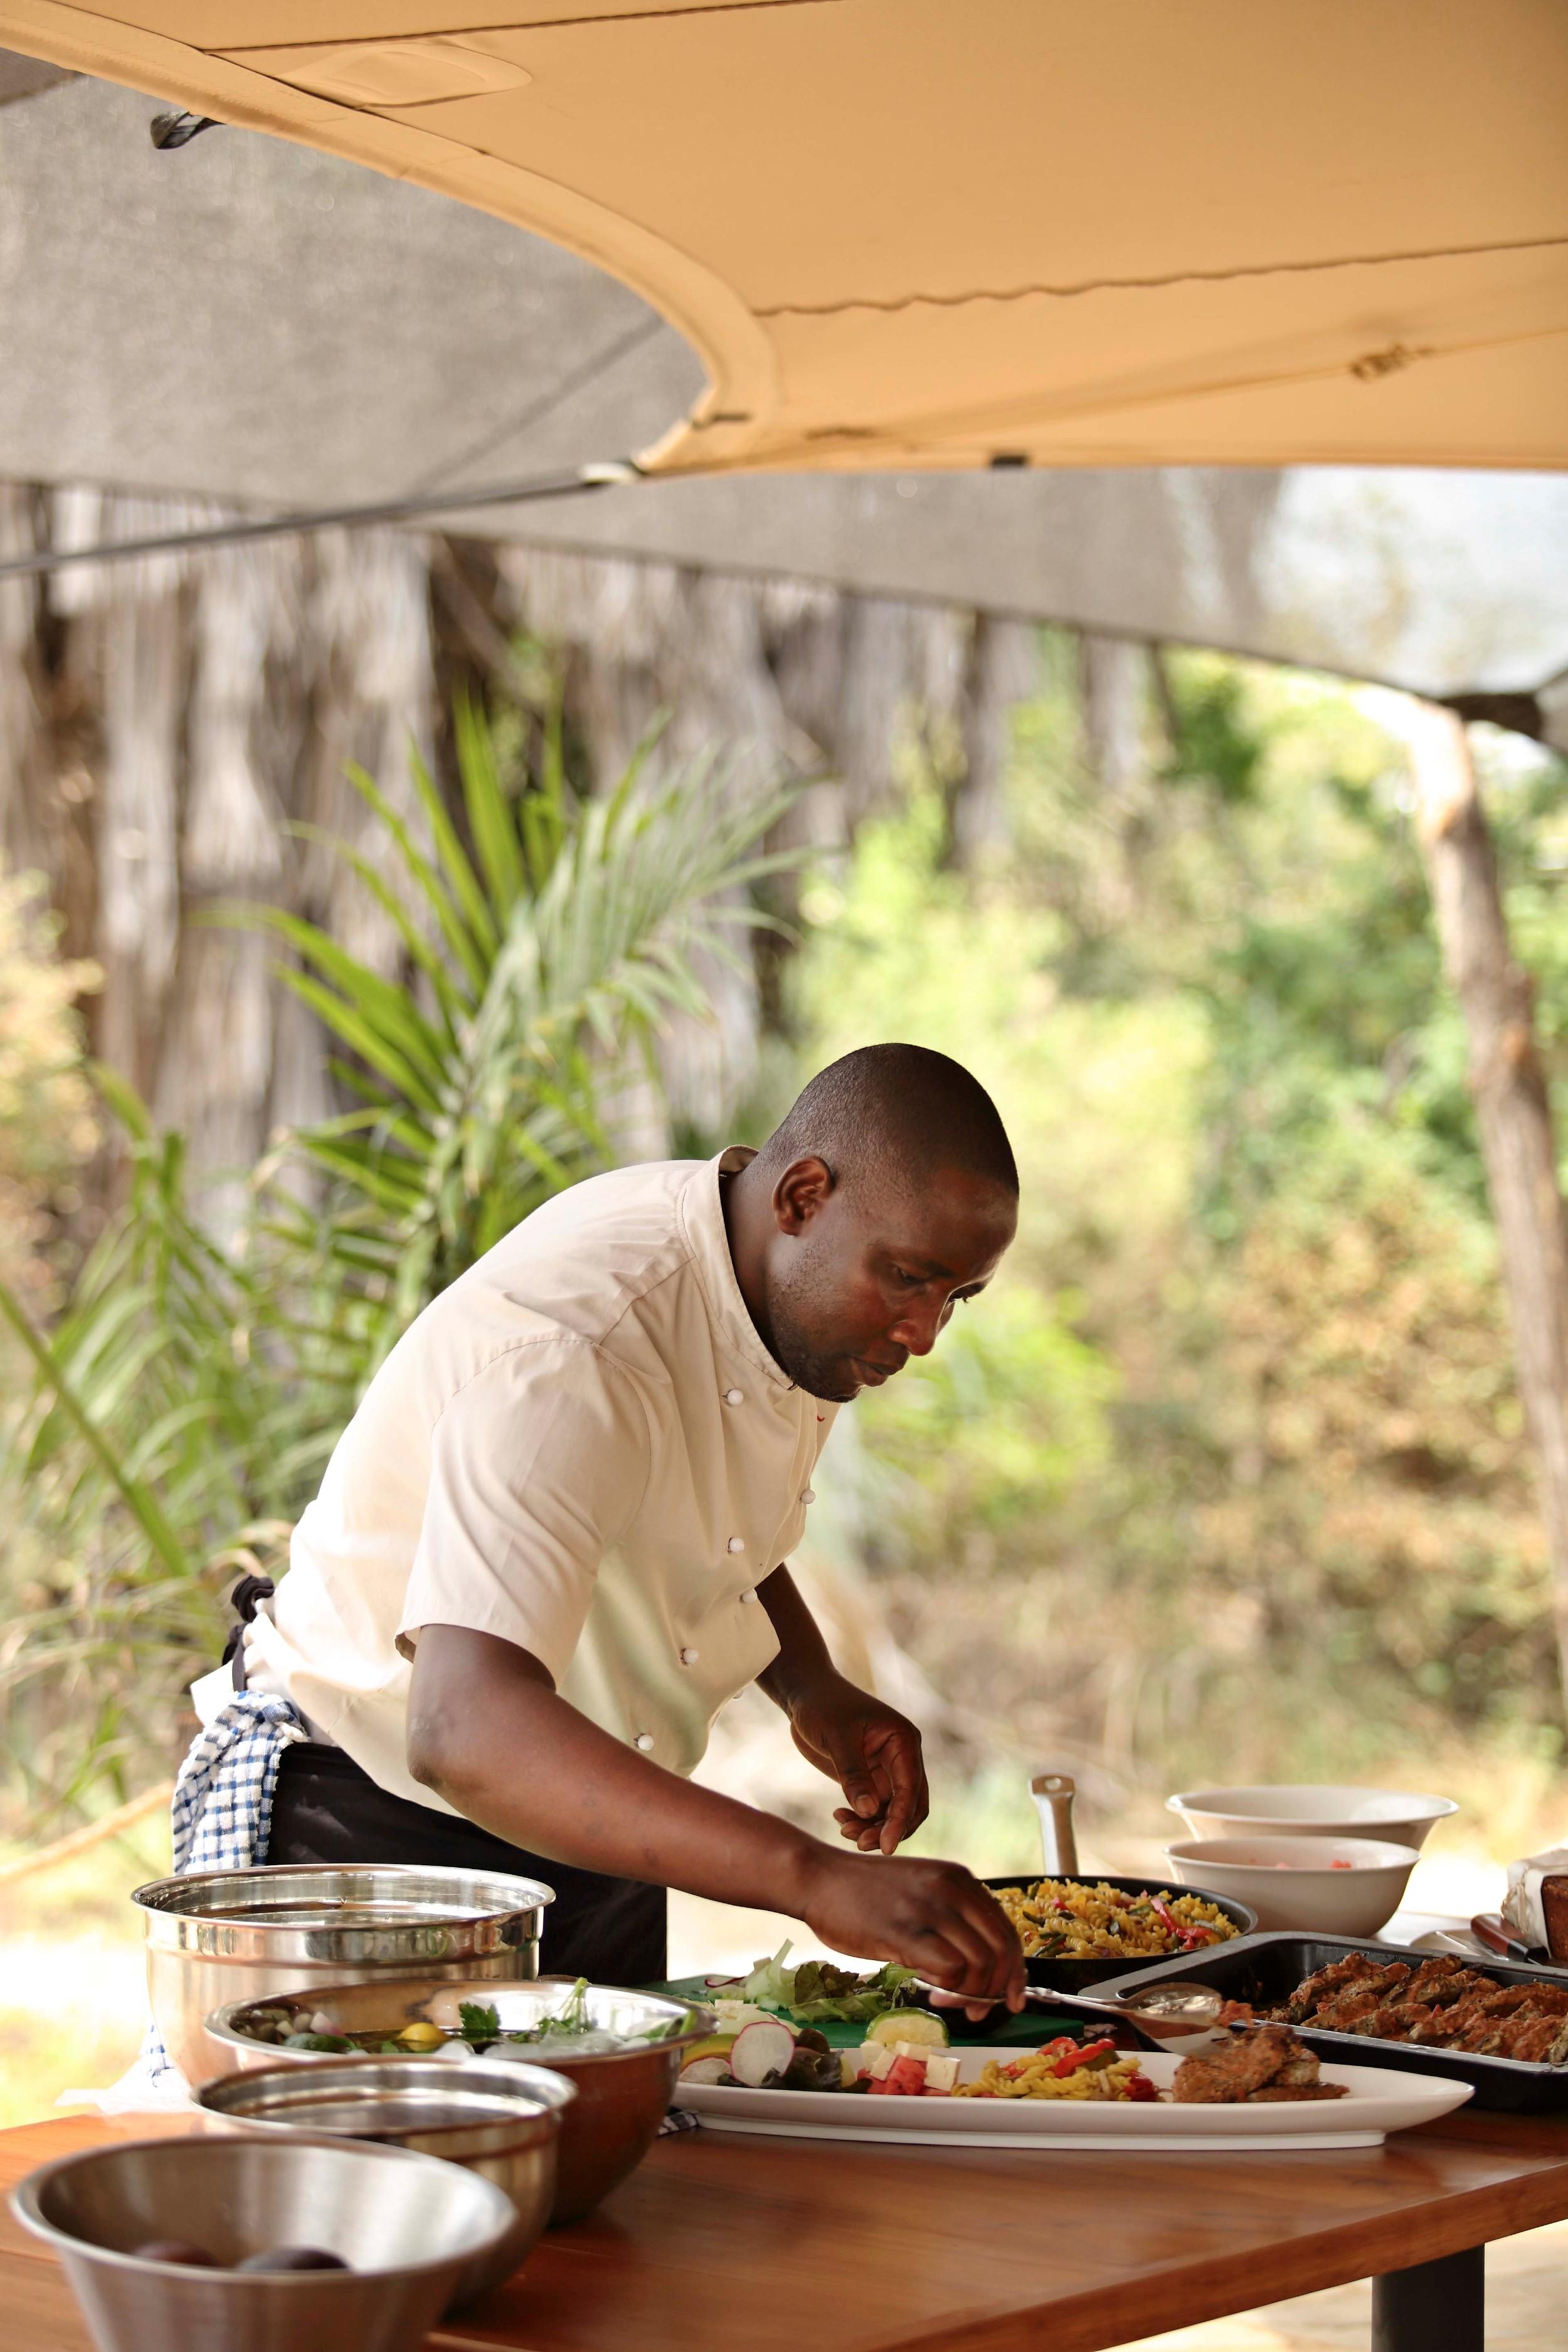 Chef-serving-luncg-Roho.jpg